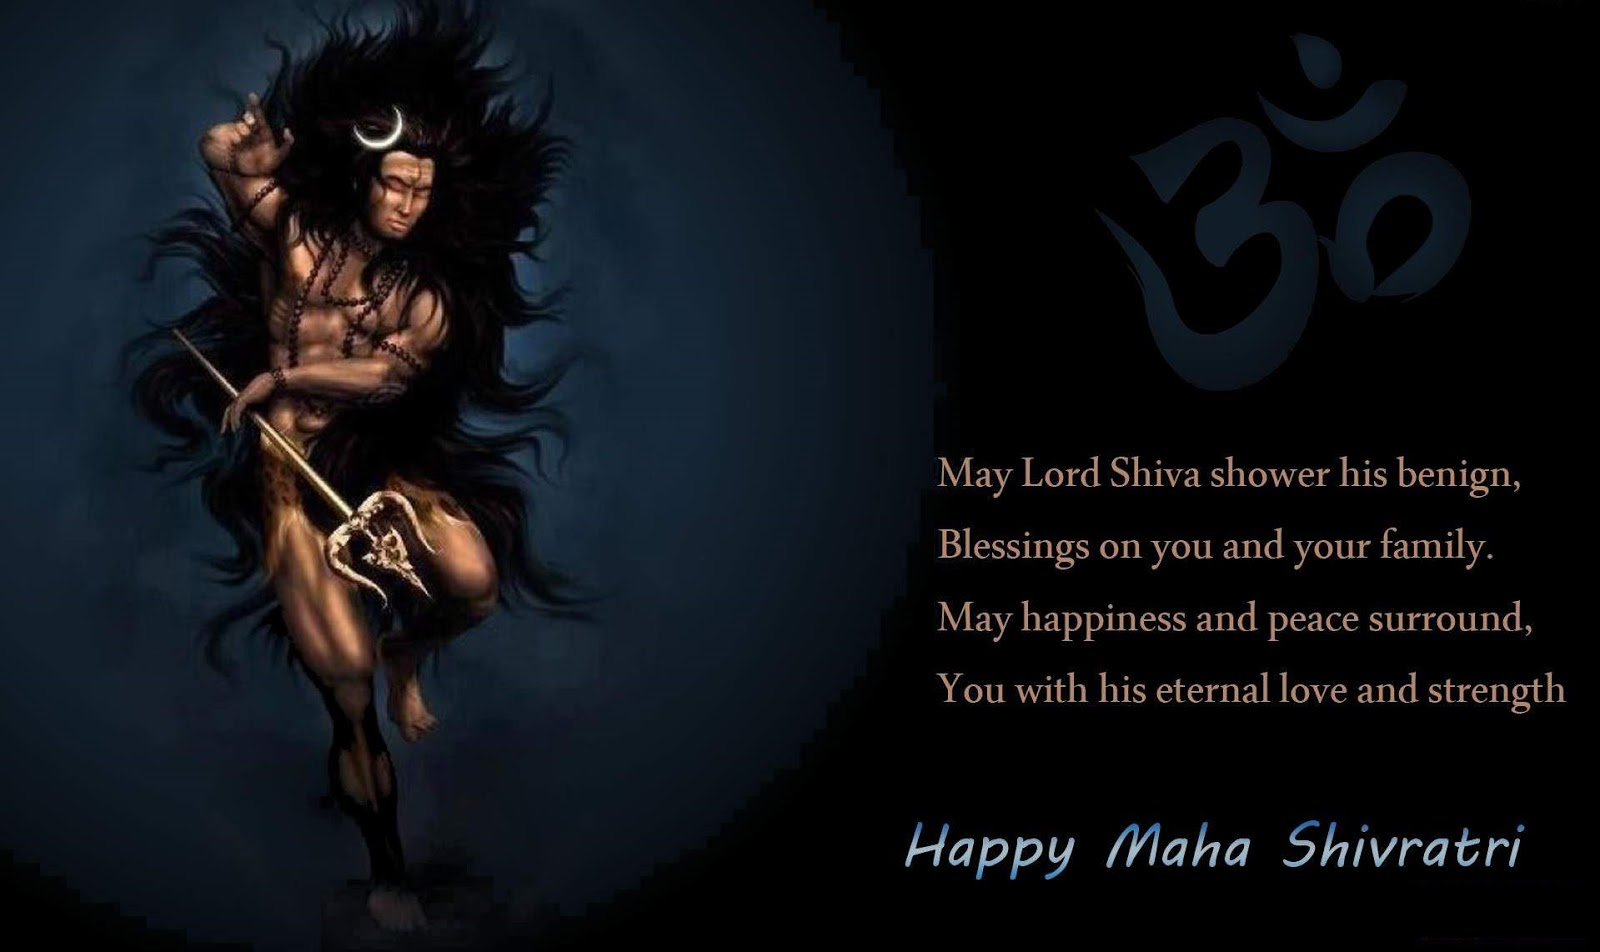 happy shivratri wishes